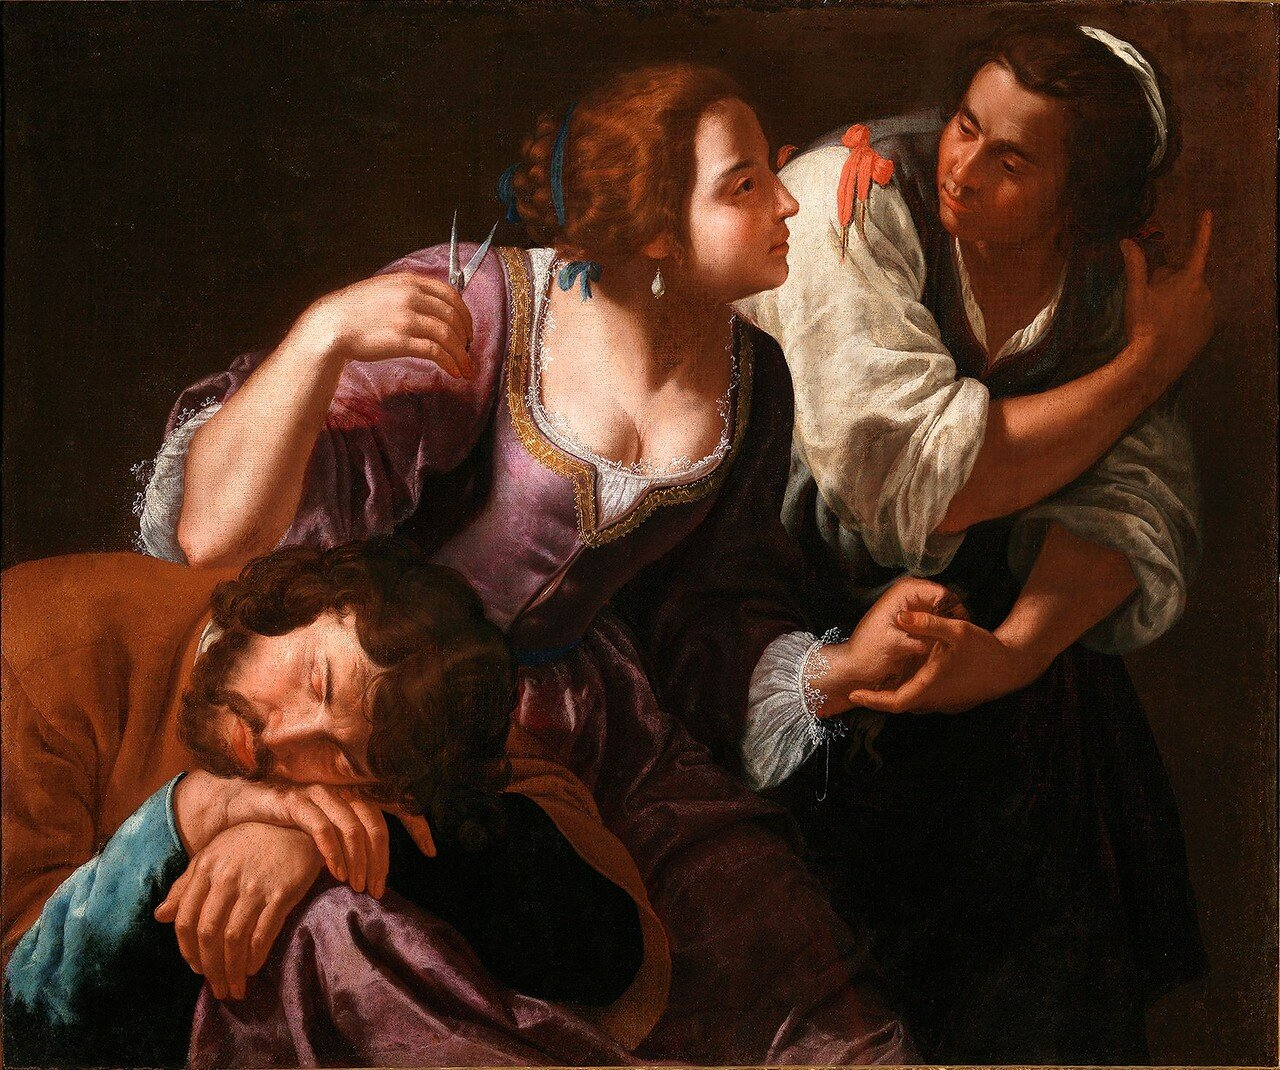 Artemisia Gentileschi / Артемизия Джентилески (1593-1653) - Sansone e Dalila / Самсон и Далила (около 1630-1638)